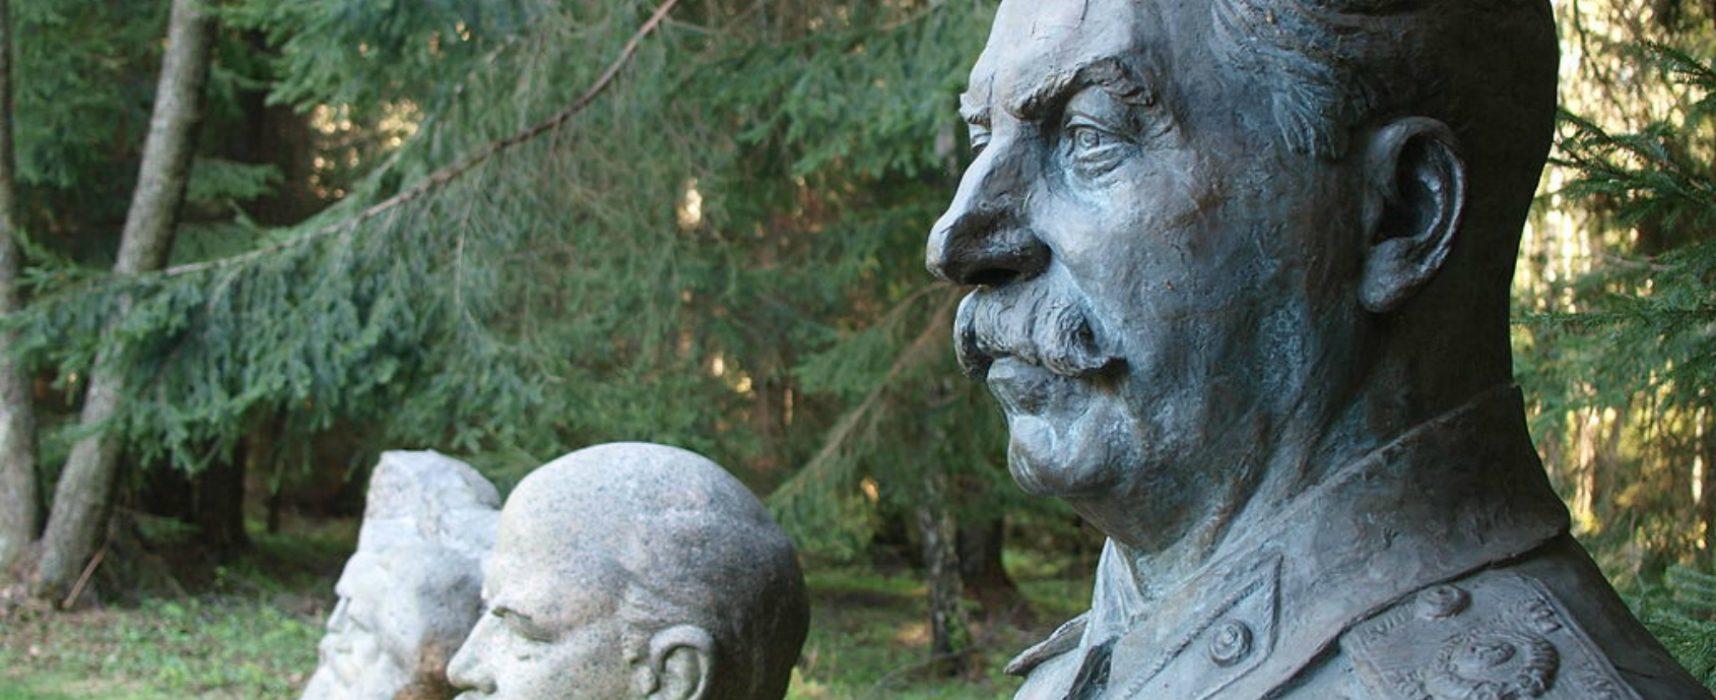 Sputnik retouches Soviet memories in Lithuania